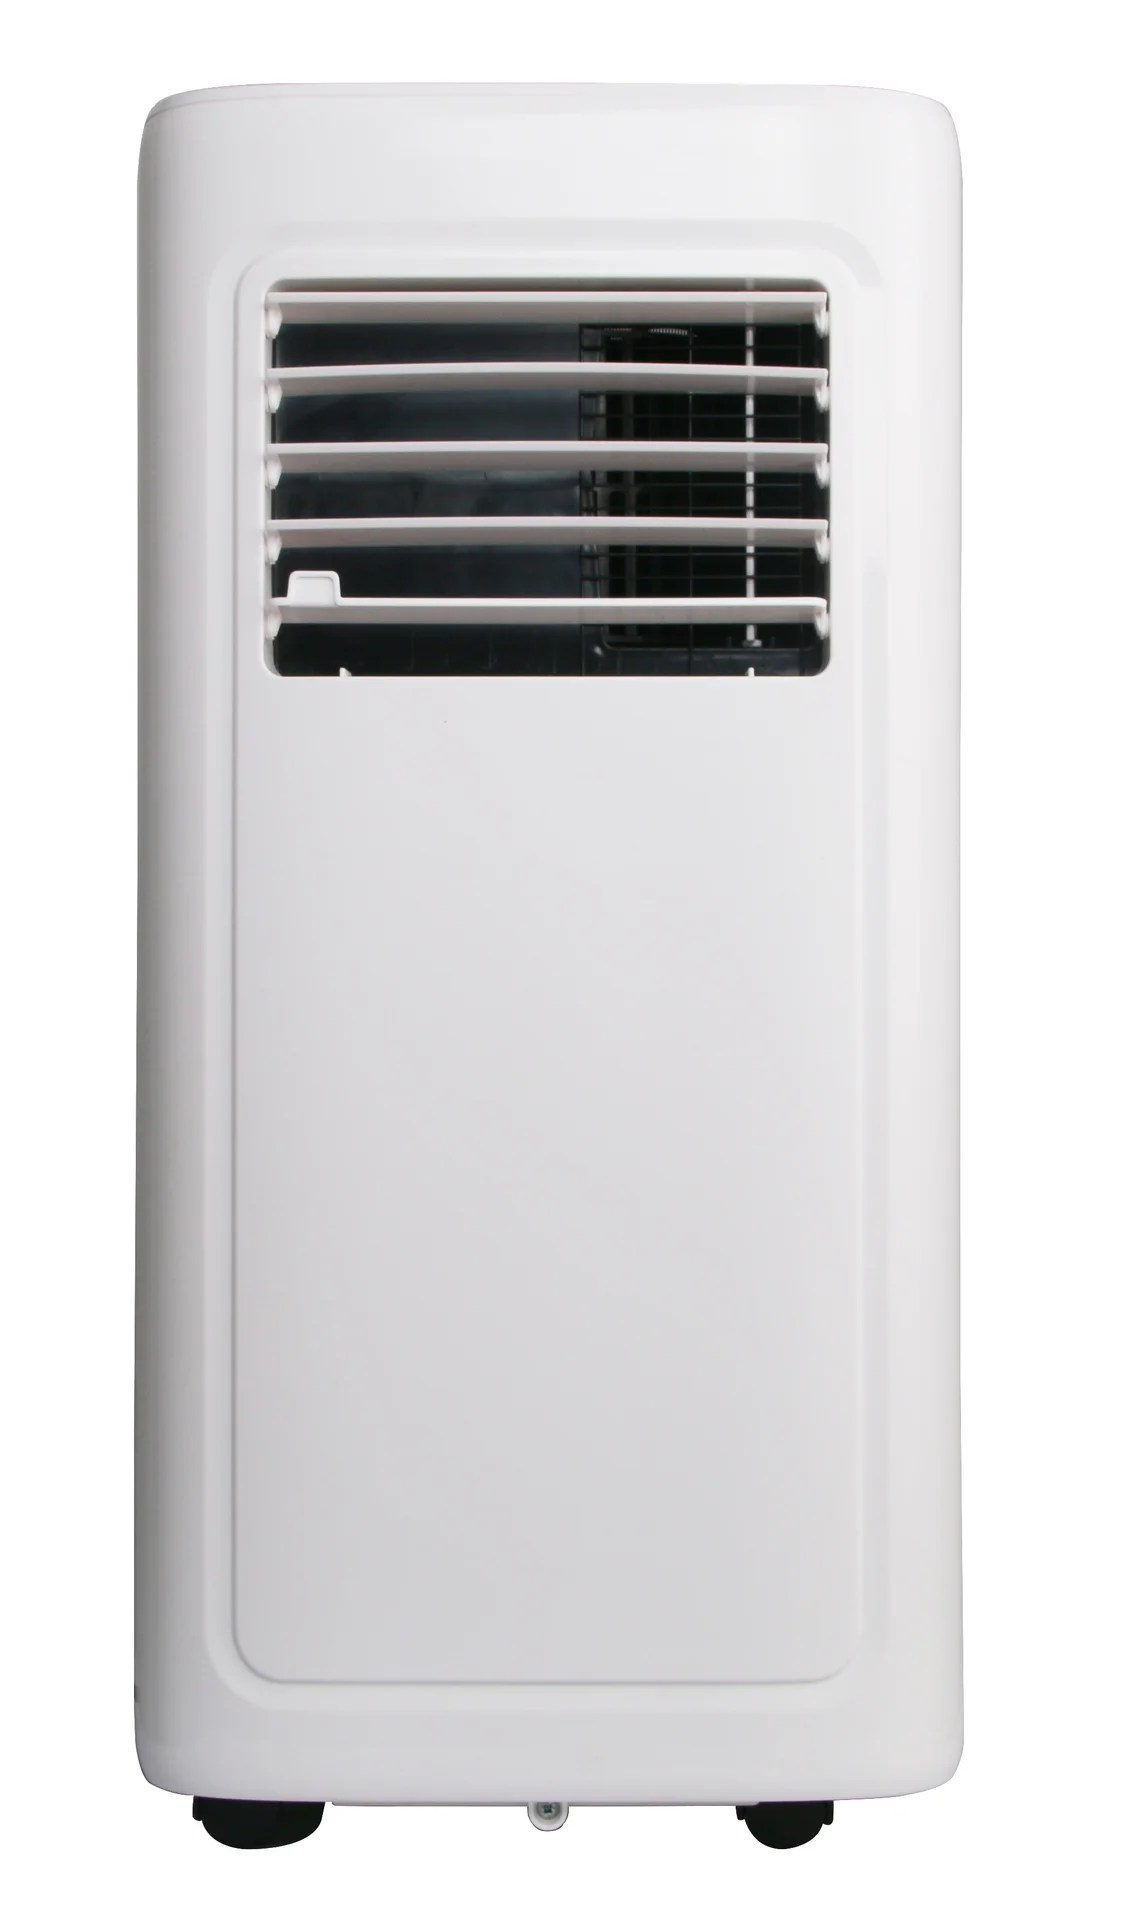 Climatiseur Mobile Optimeo Opc A0 2035 W Leroy Merlin